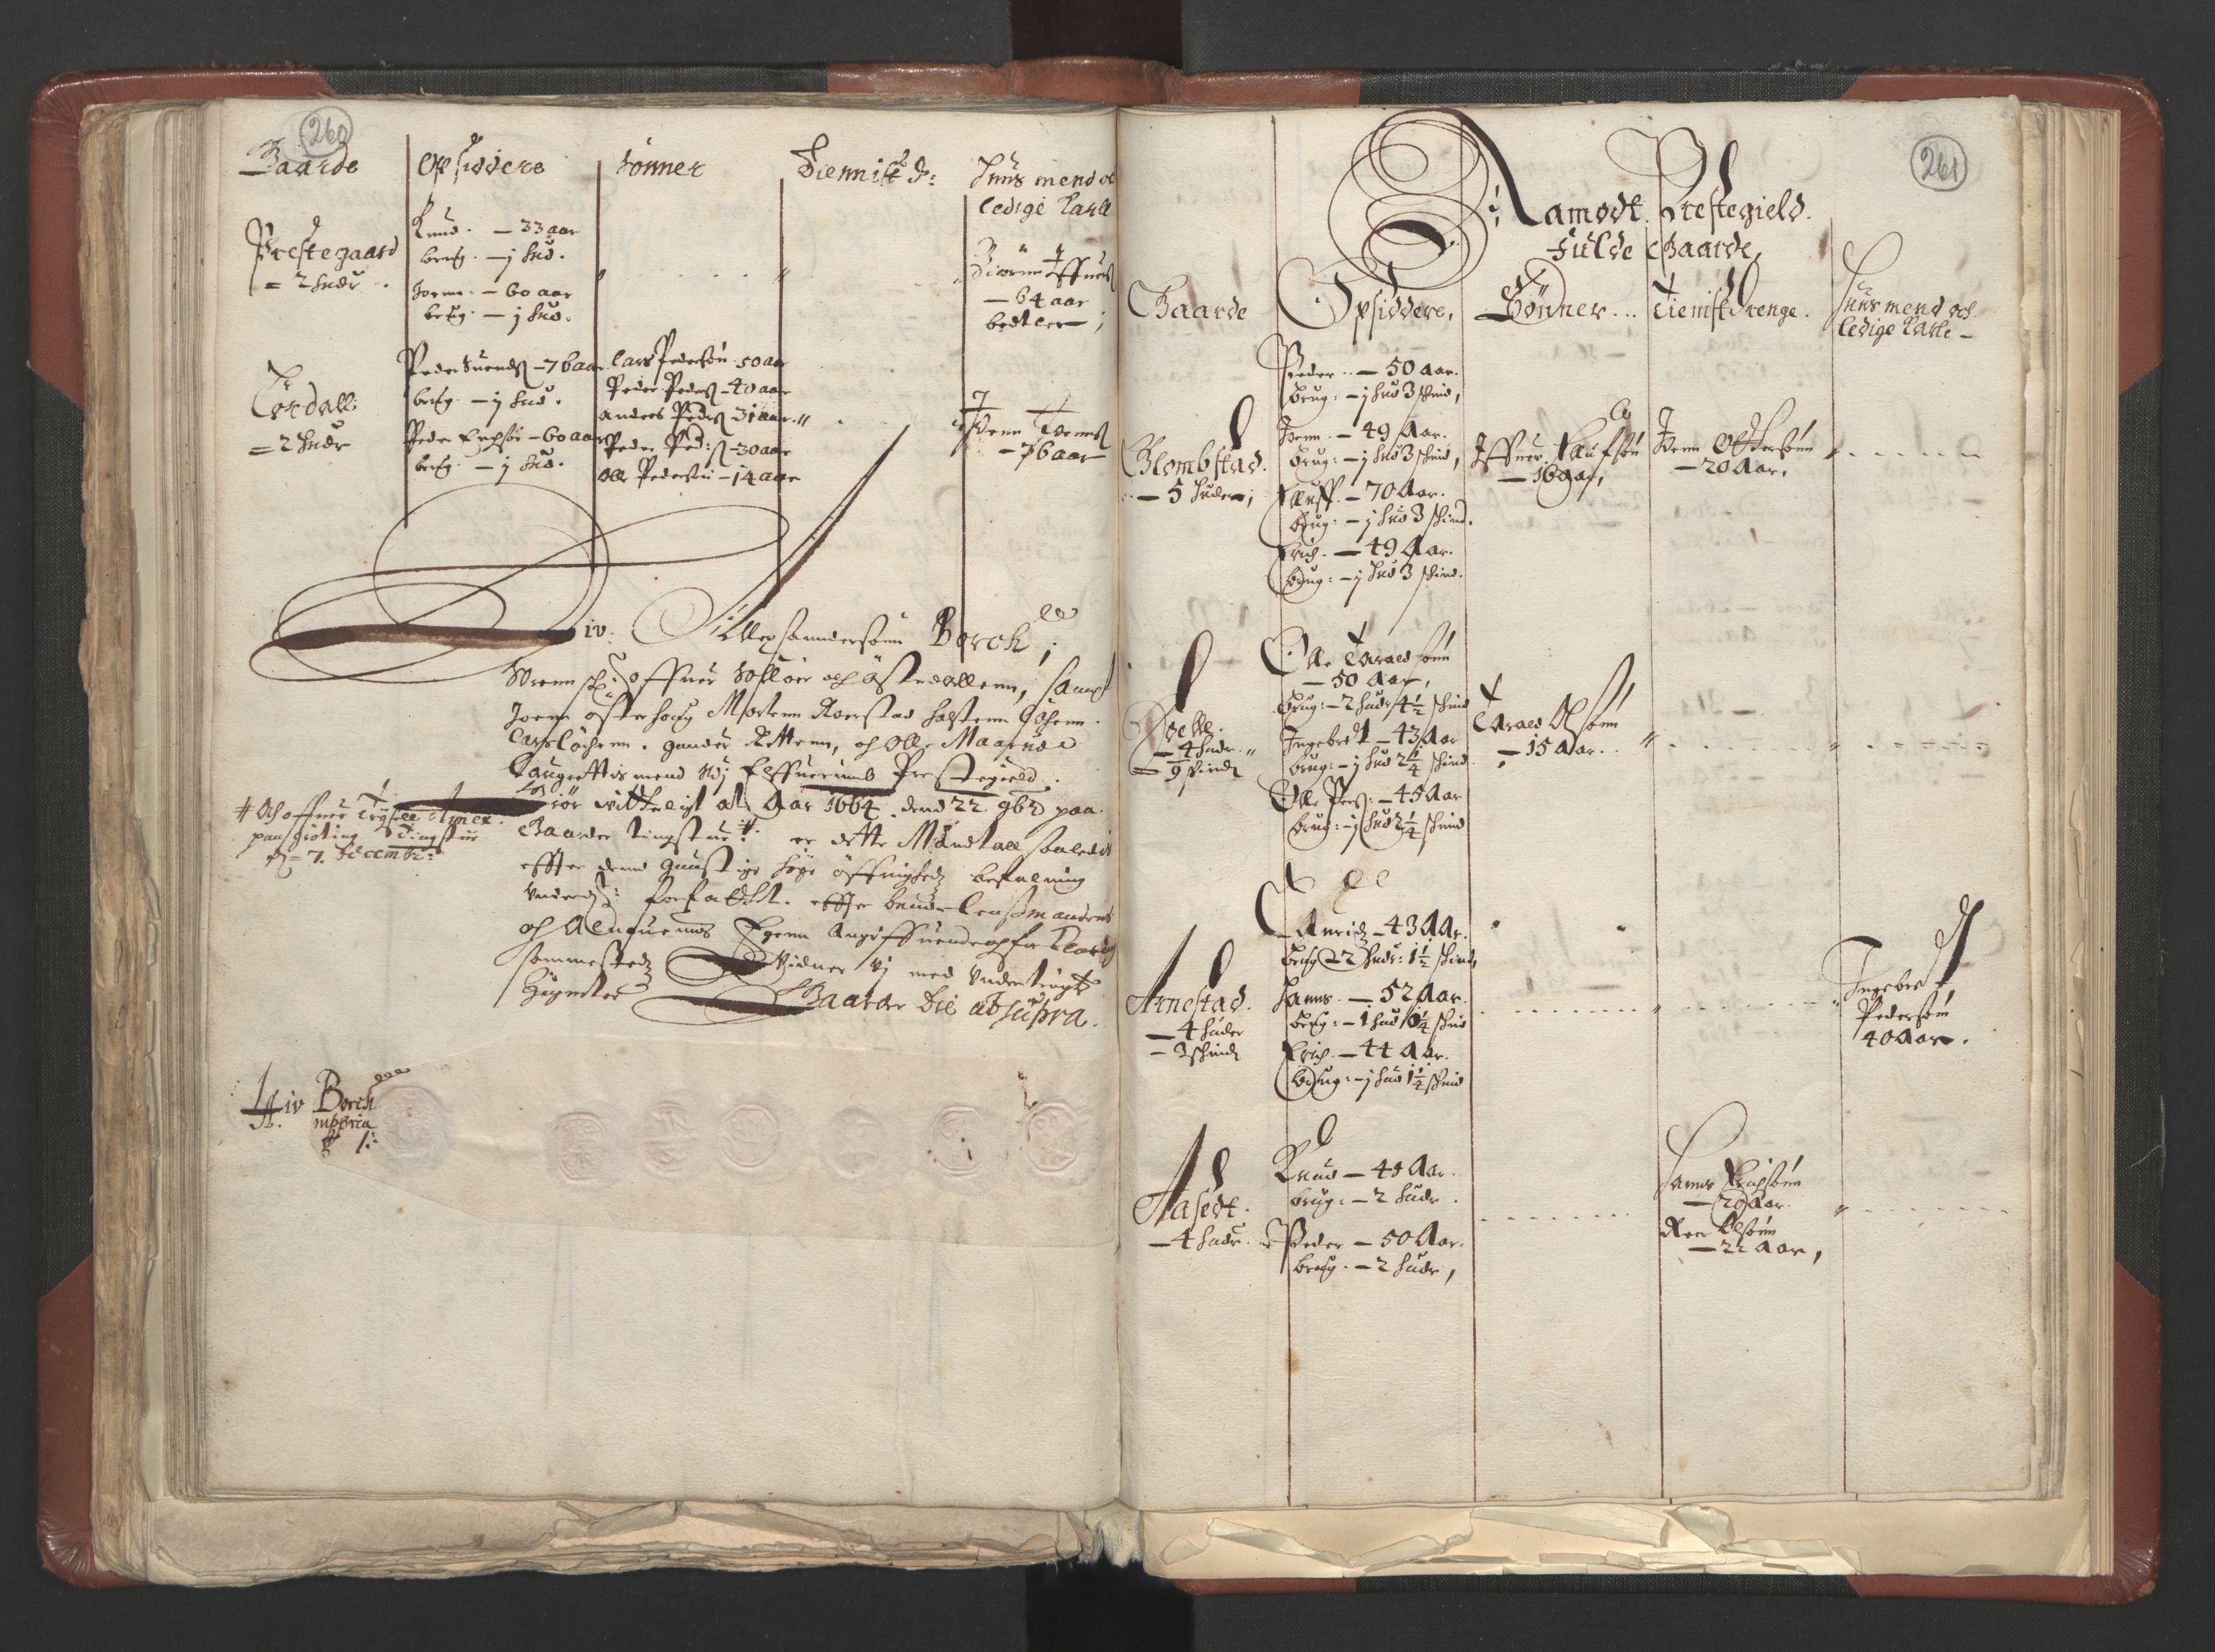 RA, Fogdenes og sorenskrivernes manntall 1664-1666, nr. 3: Hedmark fogderi og Solør, Østerdal og Odal fogderi, 1664, s. 260-261